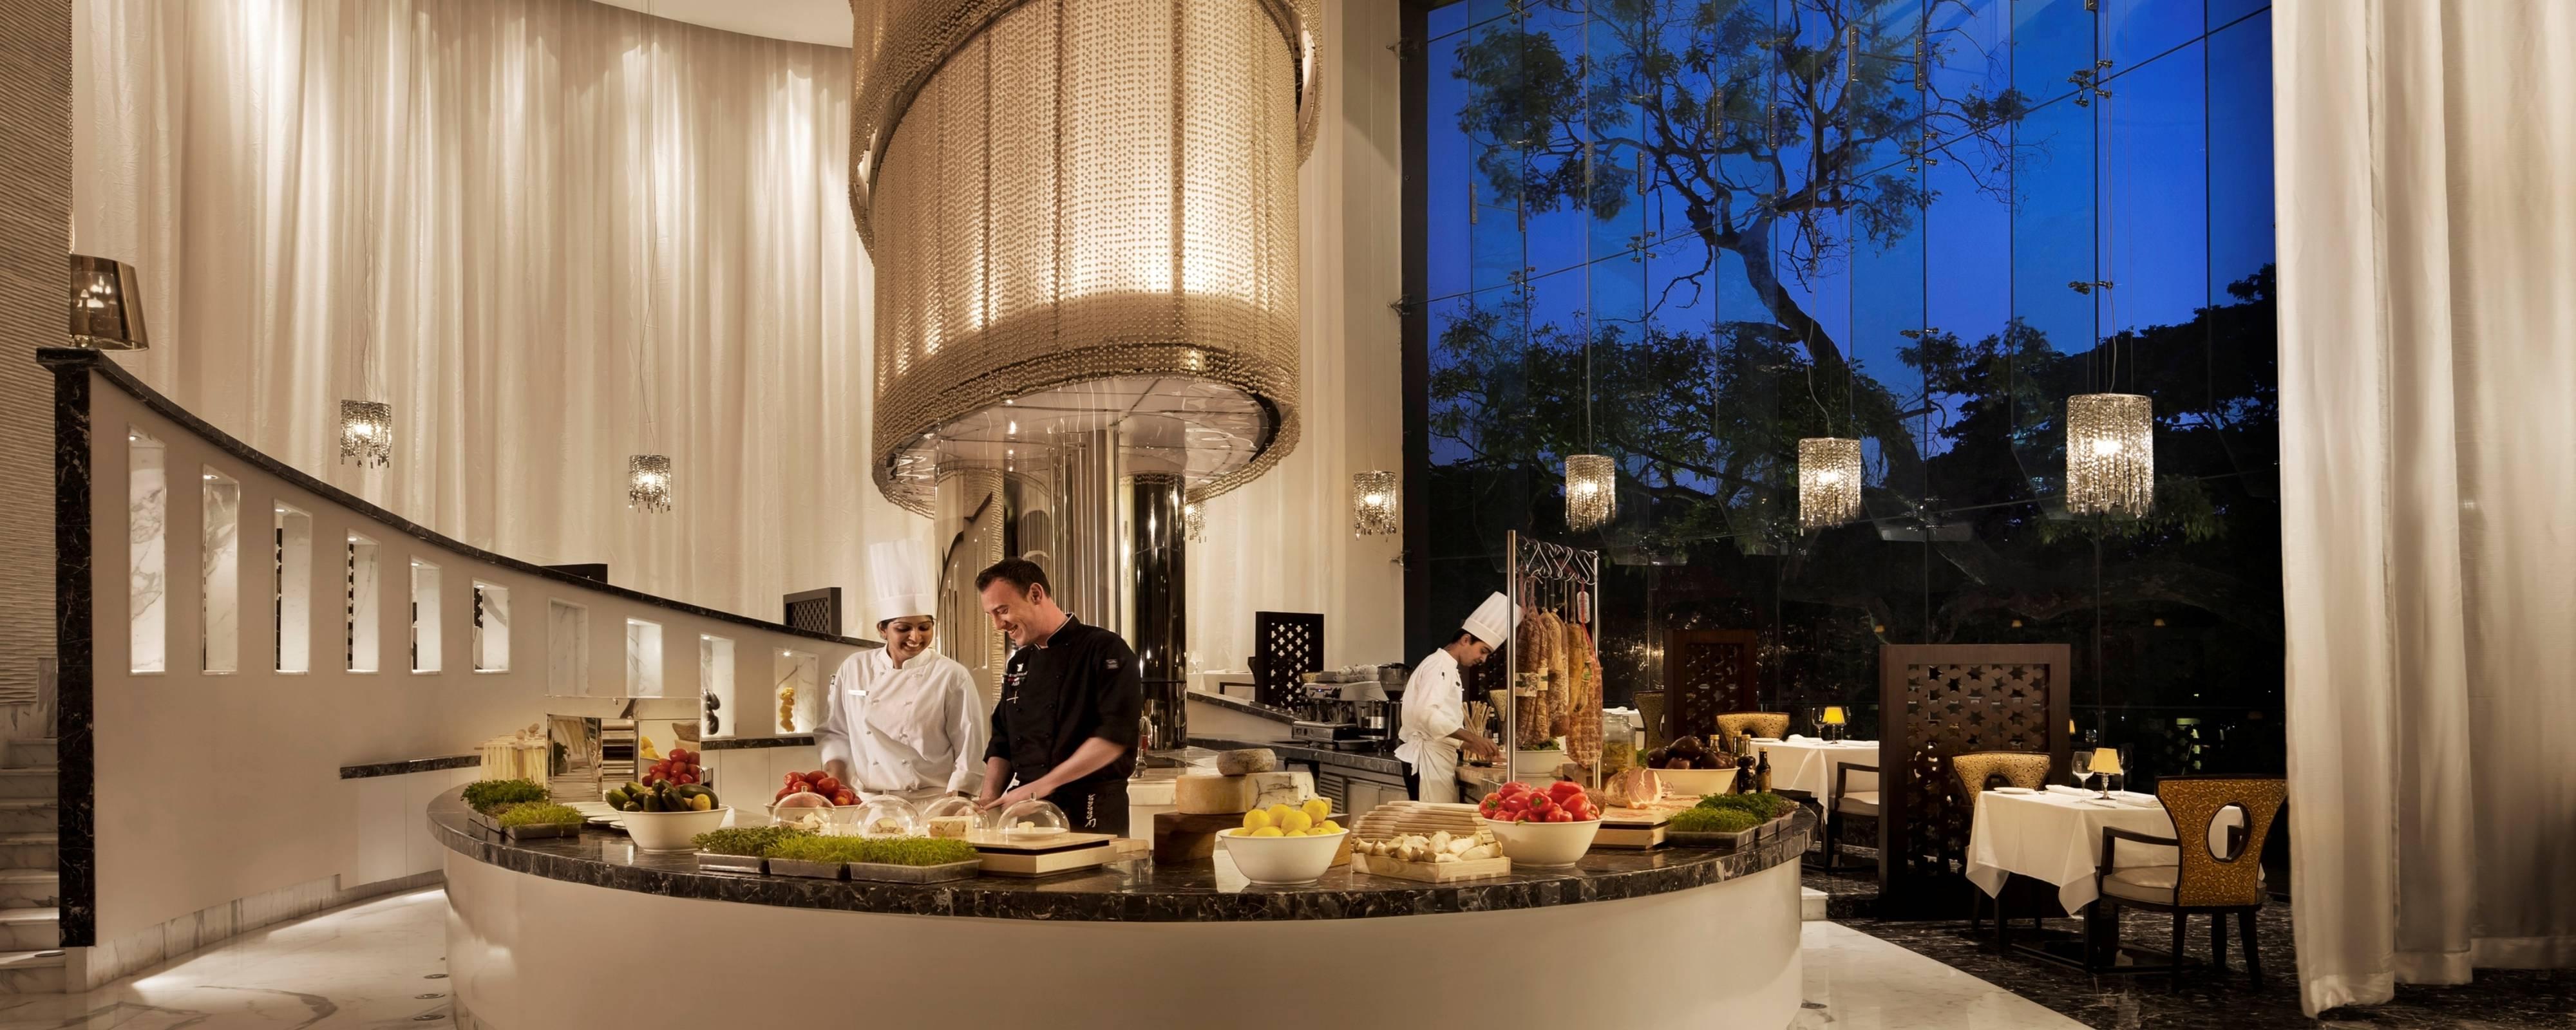 Bangalore Restaurant – Brunch – Buffet – Italian | Jw Regarding Medium Buffets With Wood Top (View 4 of 20)